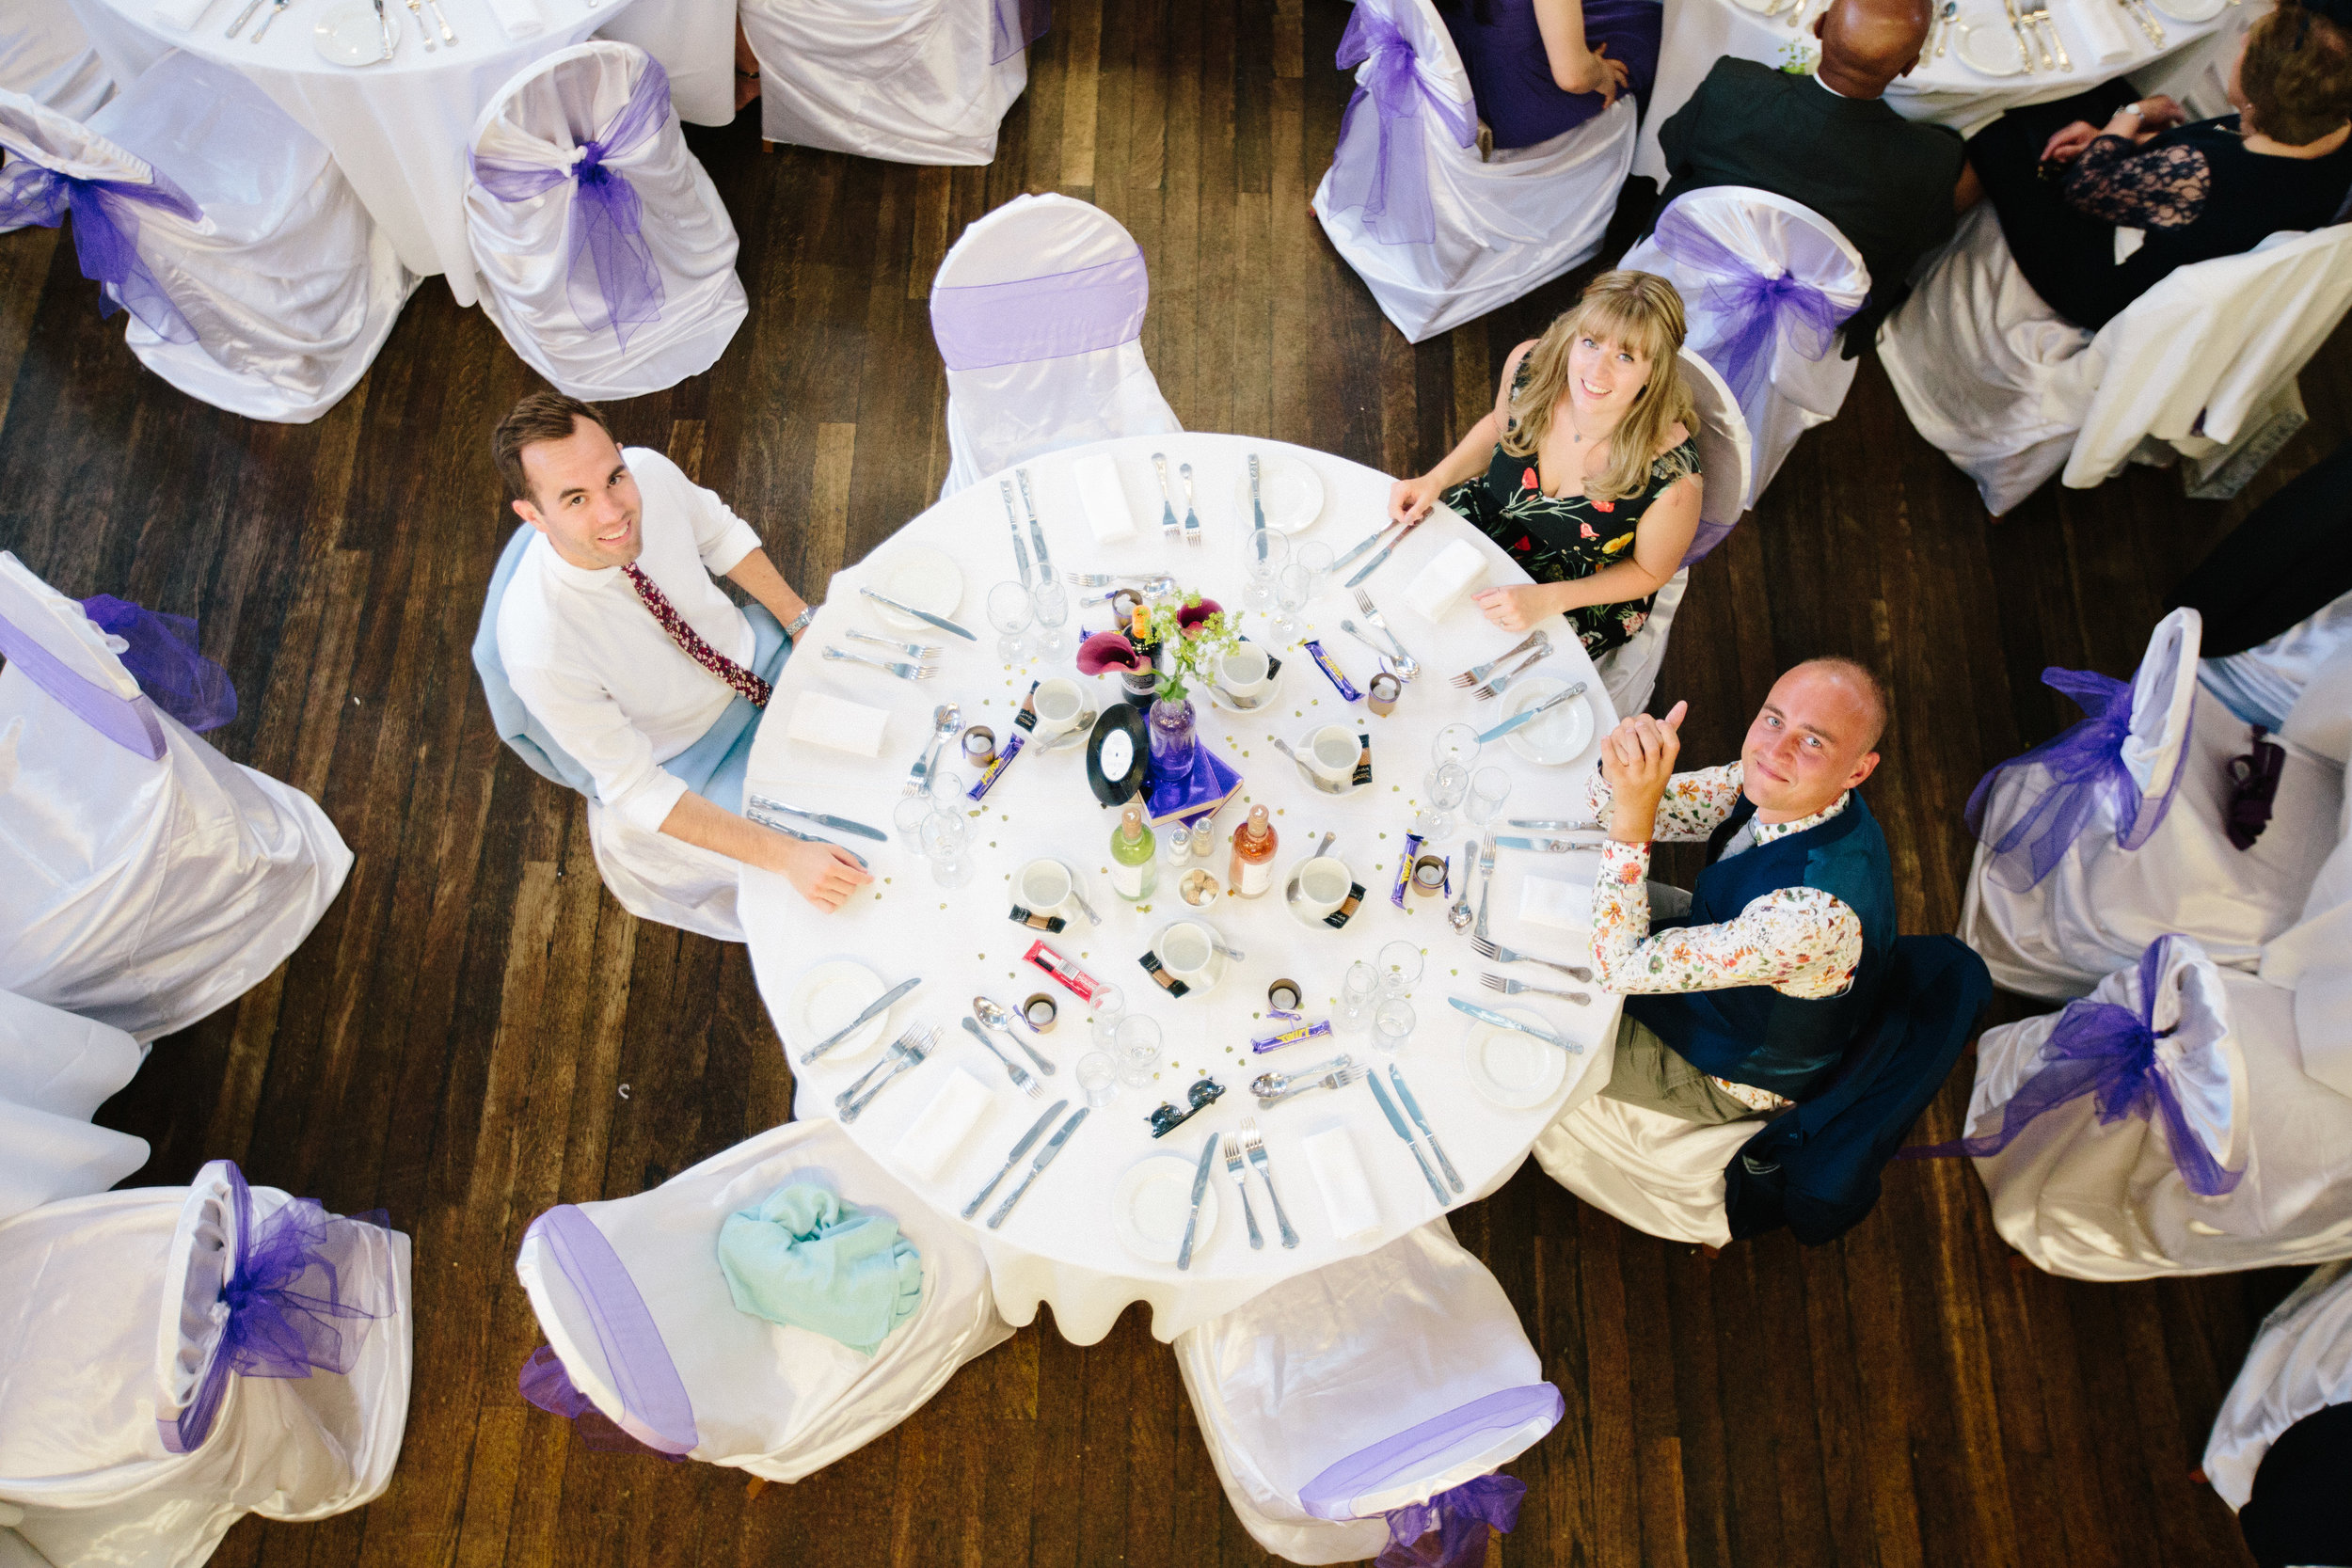 Saint-Alfege-Church-greenwich-wedding-charlton-house-reception-231